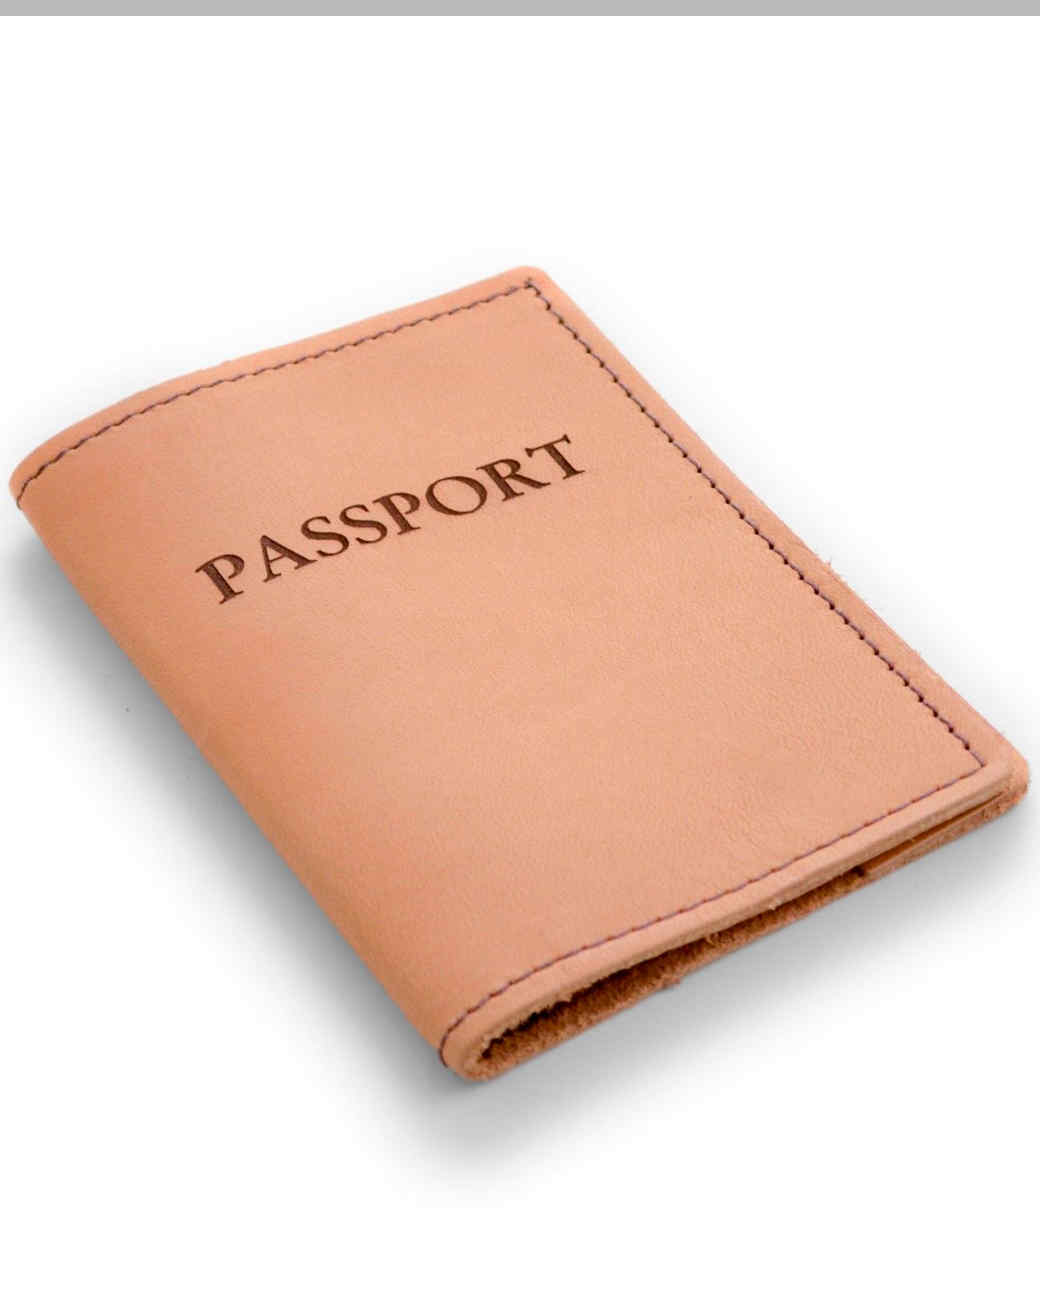 rustico-passport-cover-1412.jpg